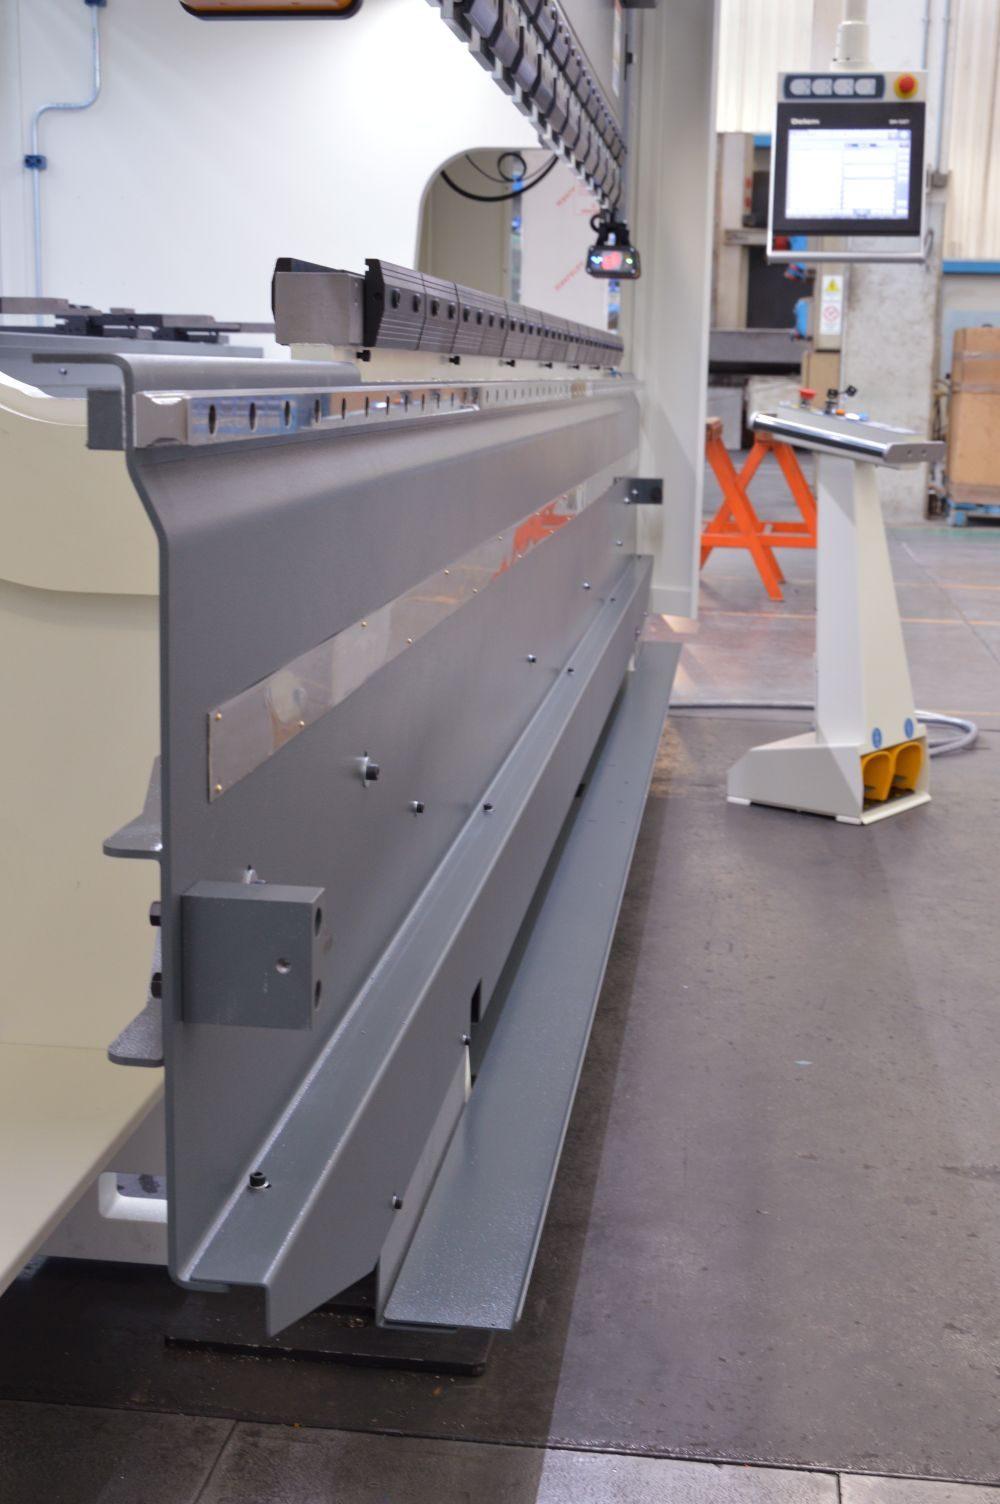 bancada prensa plegadora 100 toneladas 3 metros